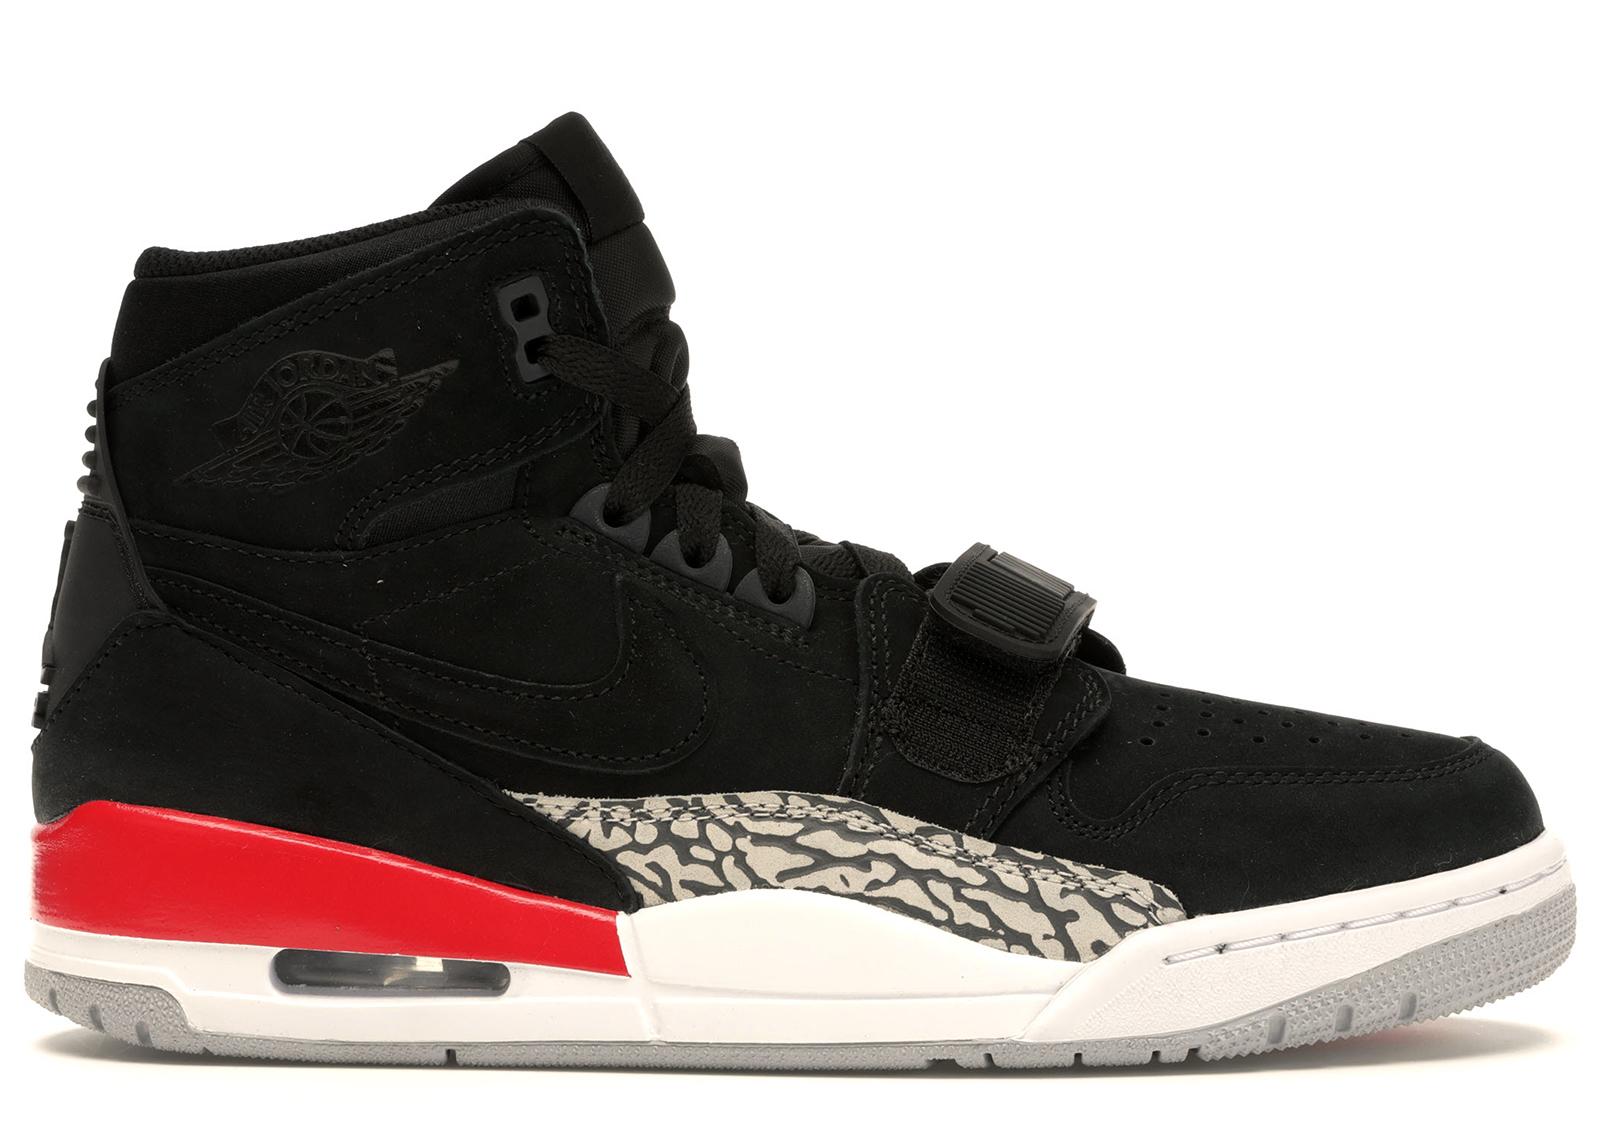 Jordan Legacy 312 Black Fire Red